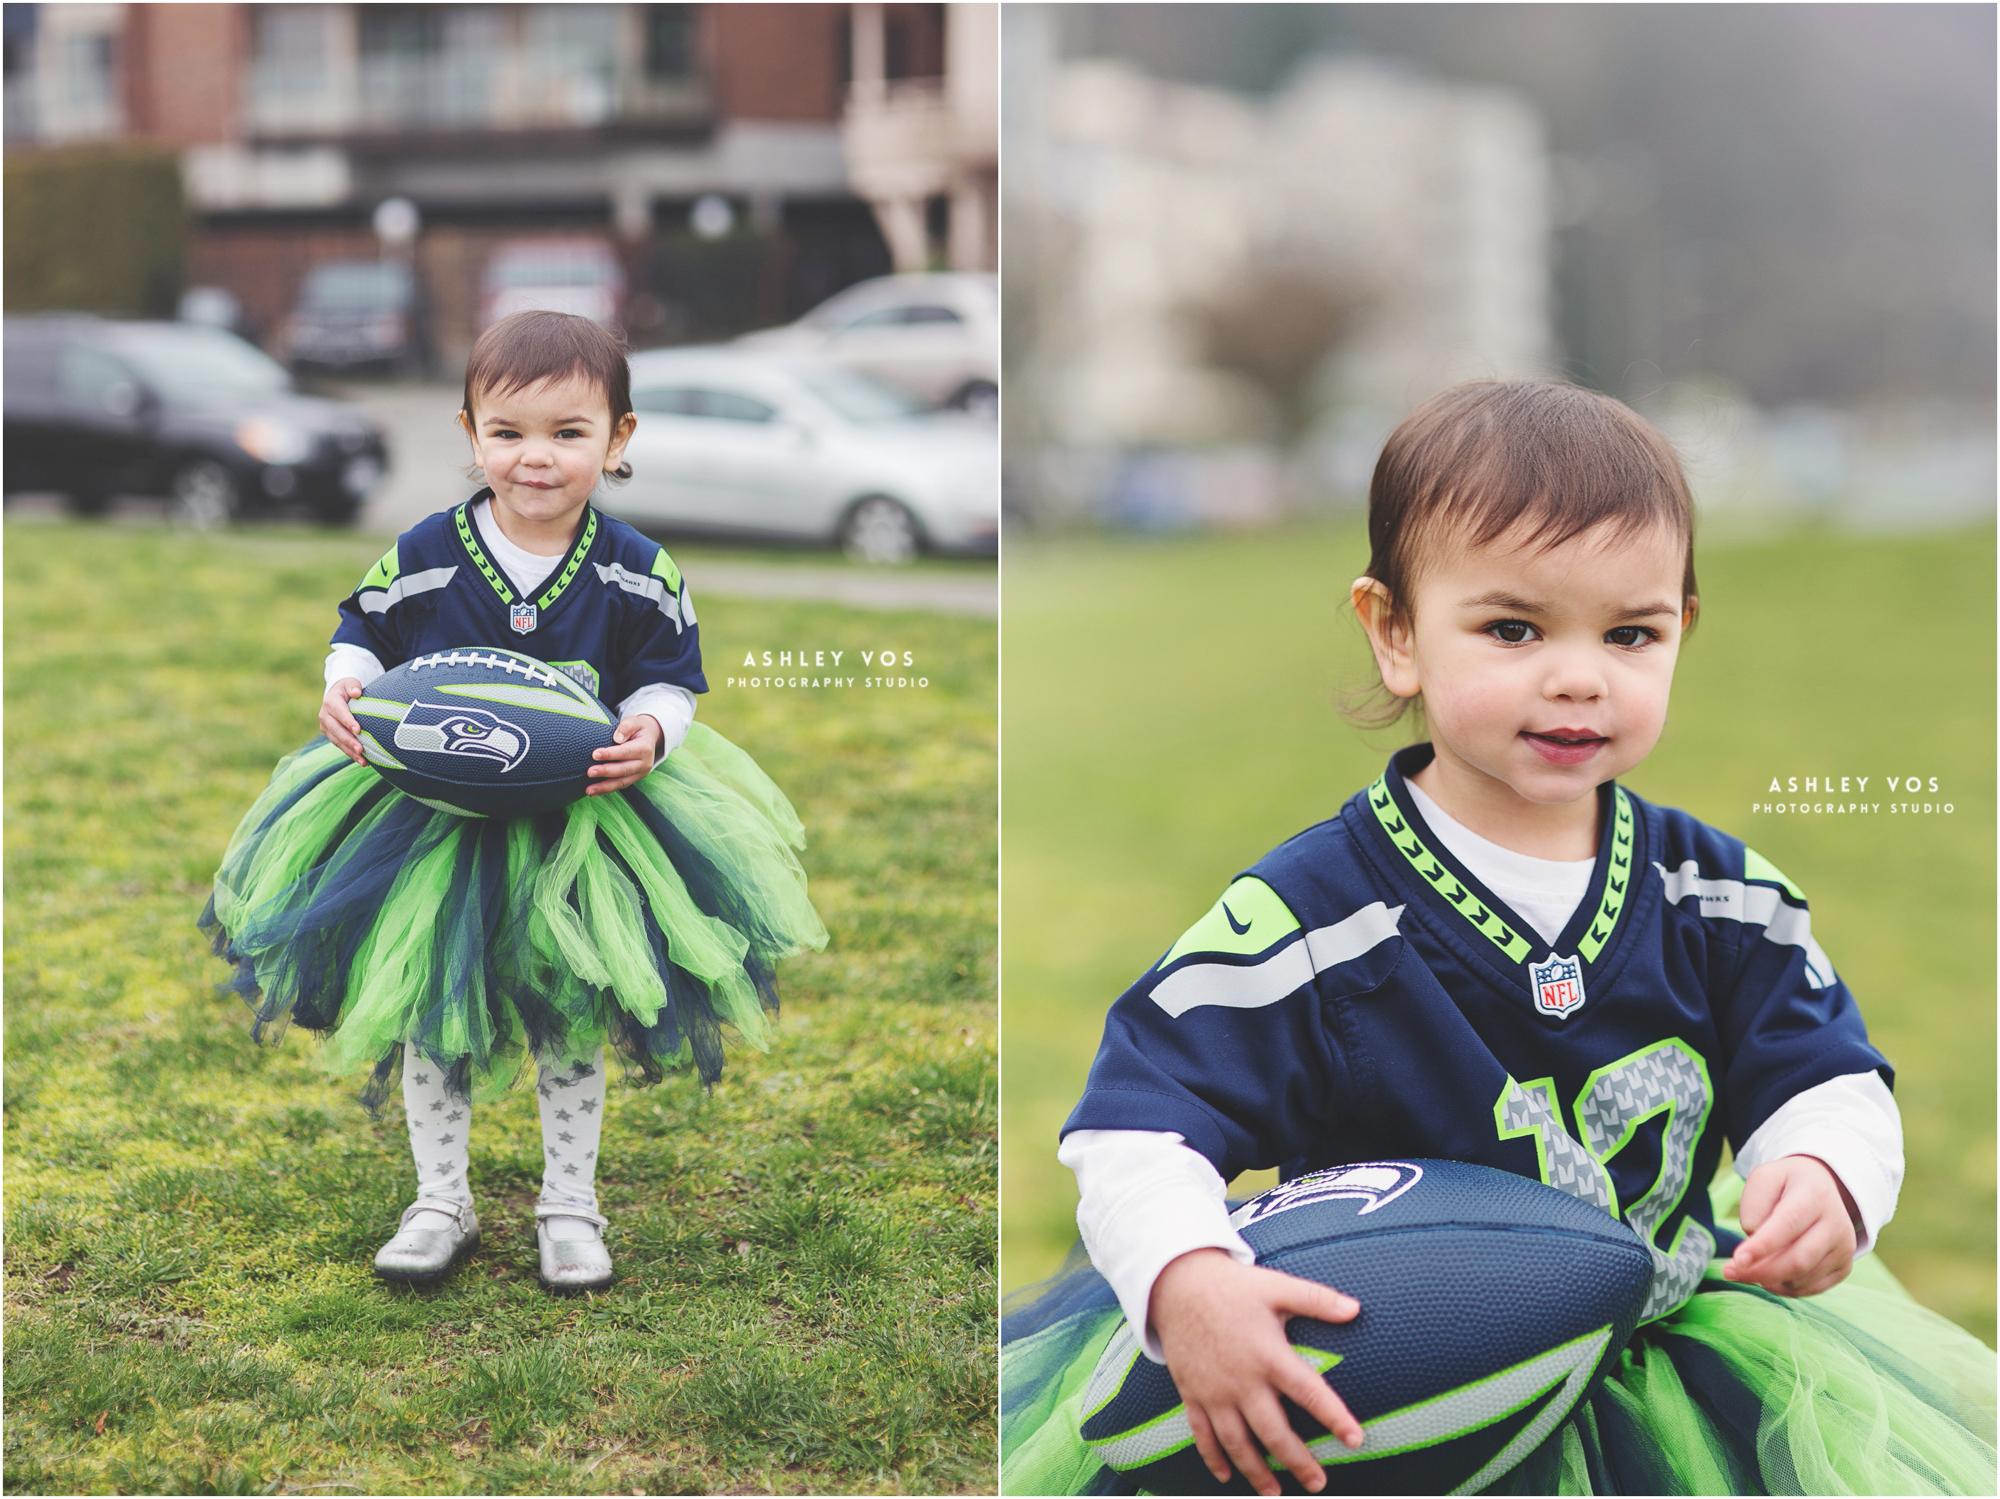 seattle tacoma birthday childrens photographer_0006.jpg